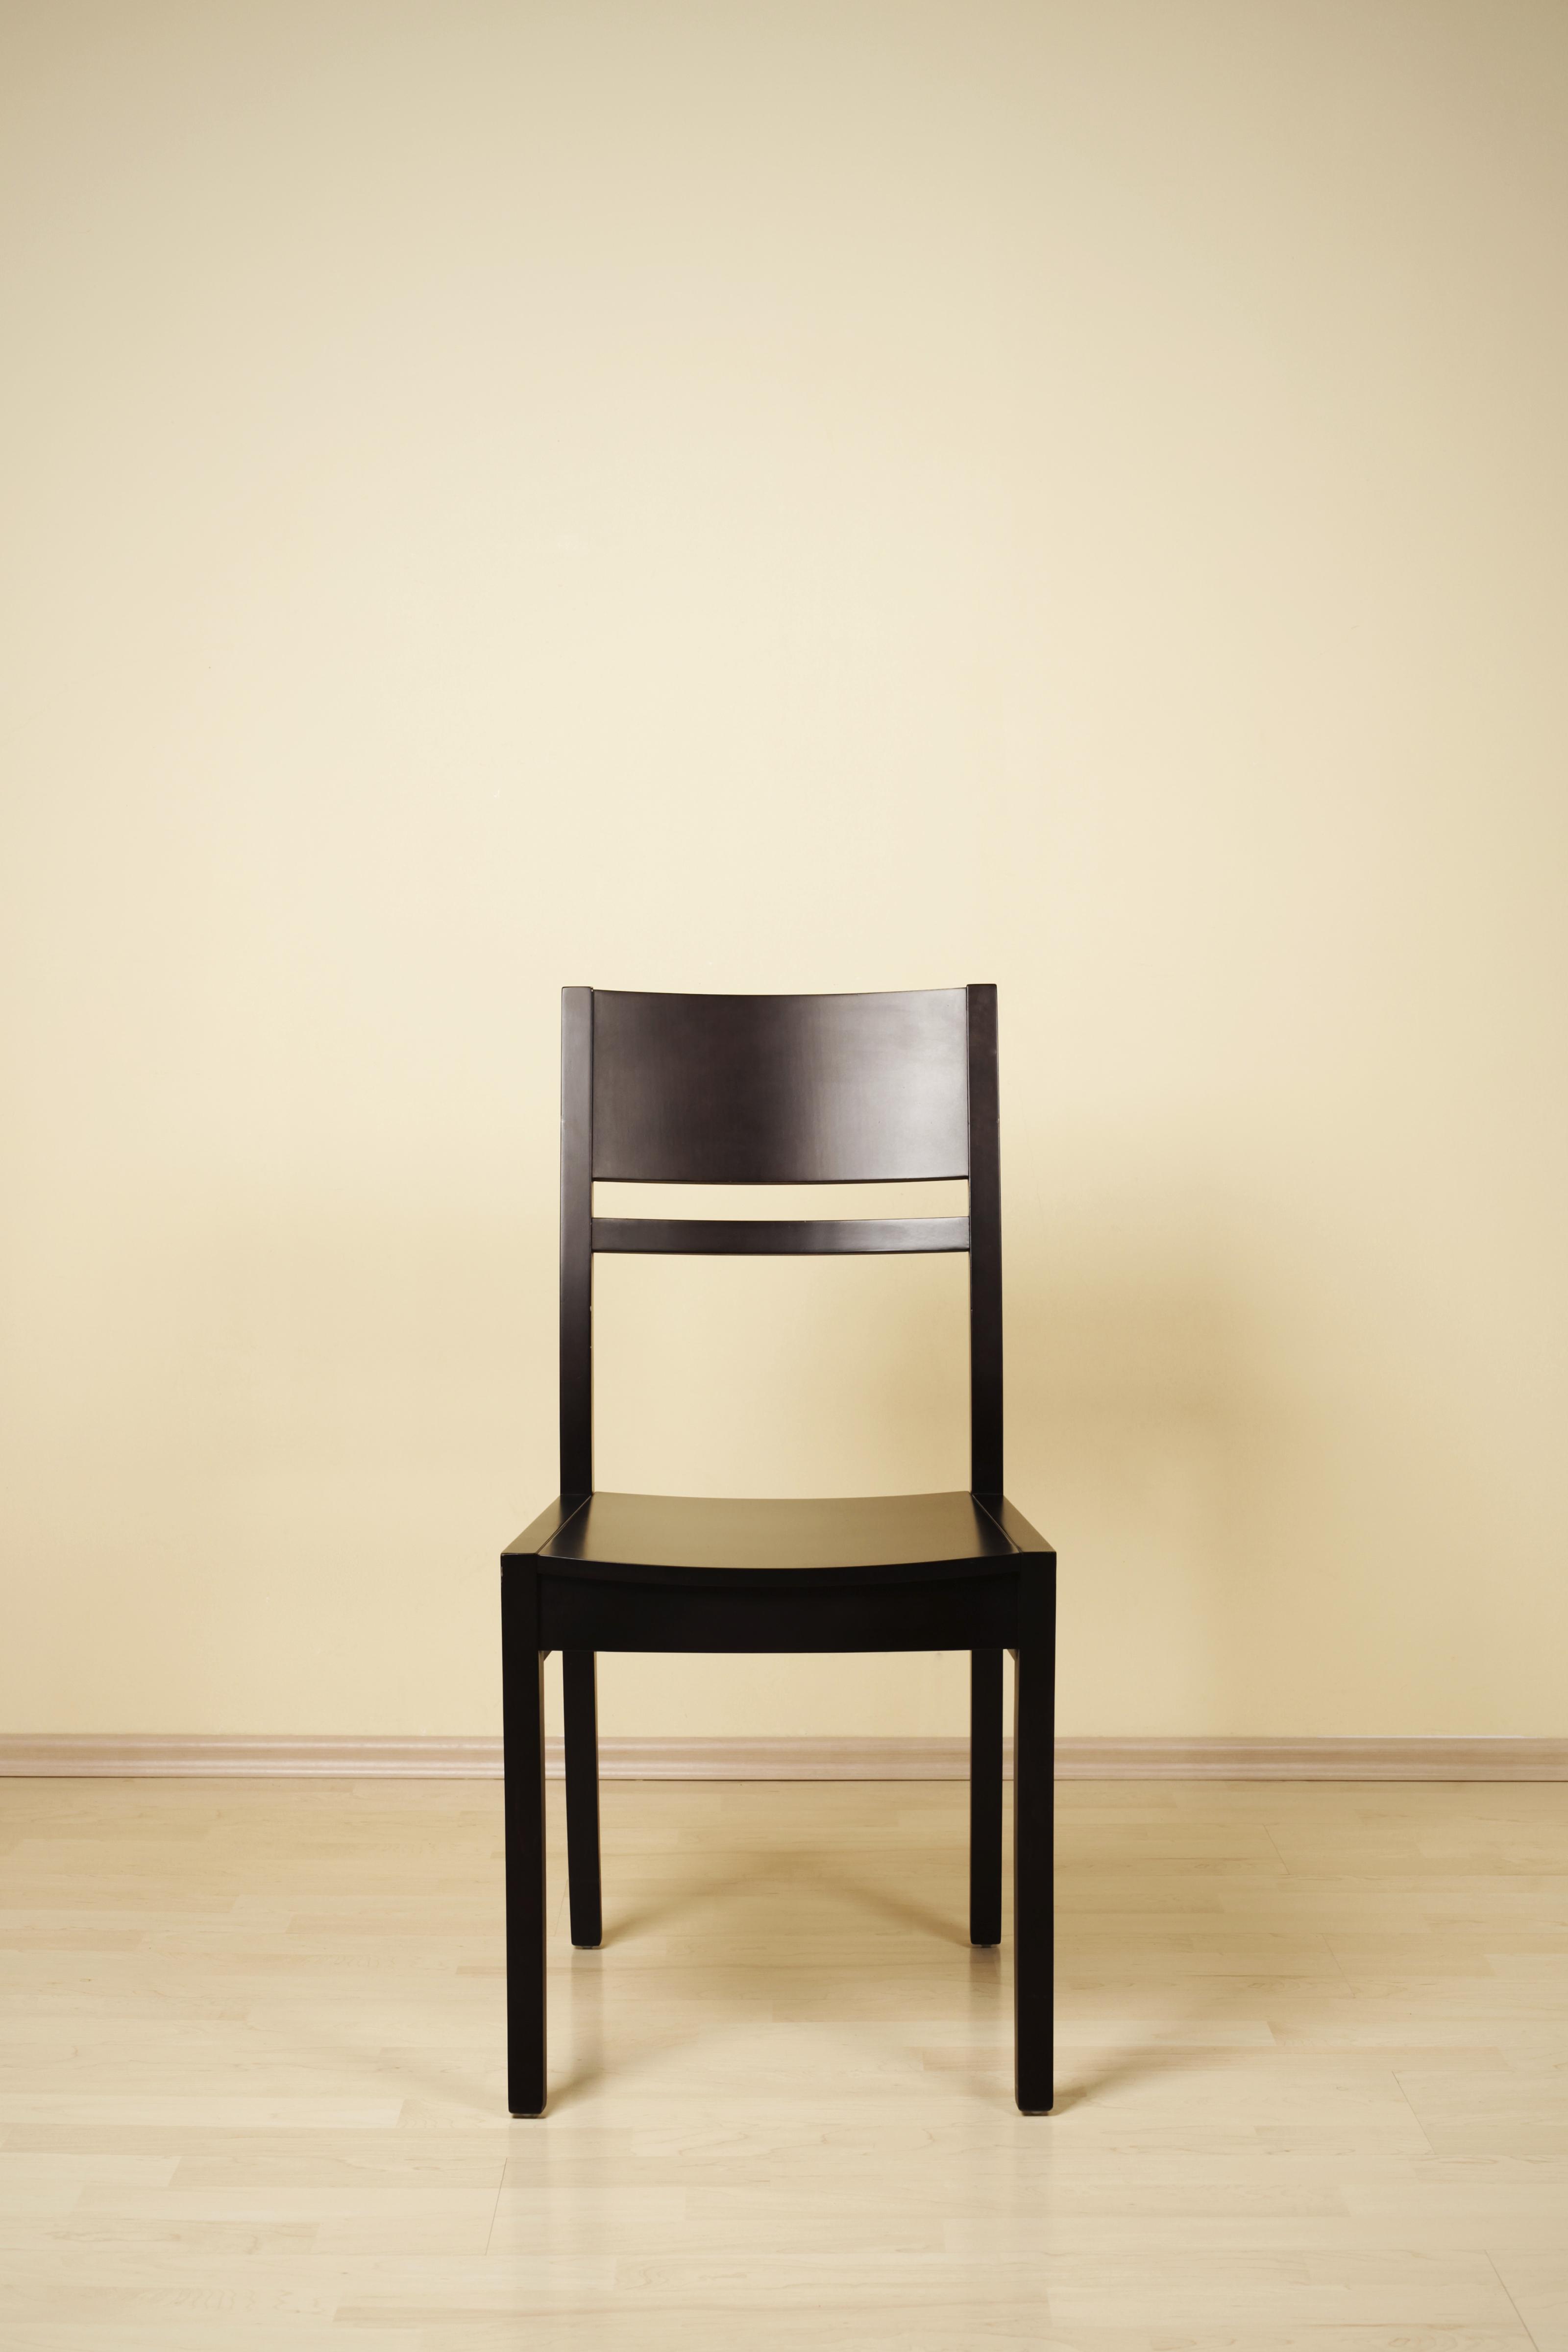 http://www.katiearnoldi.com/wp-content/uploads/2013/05/chair.jpg